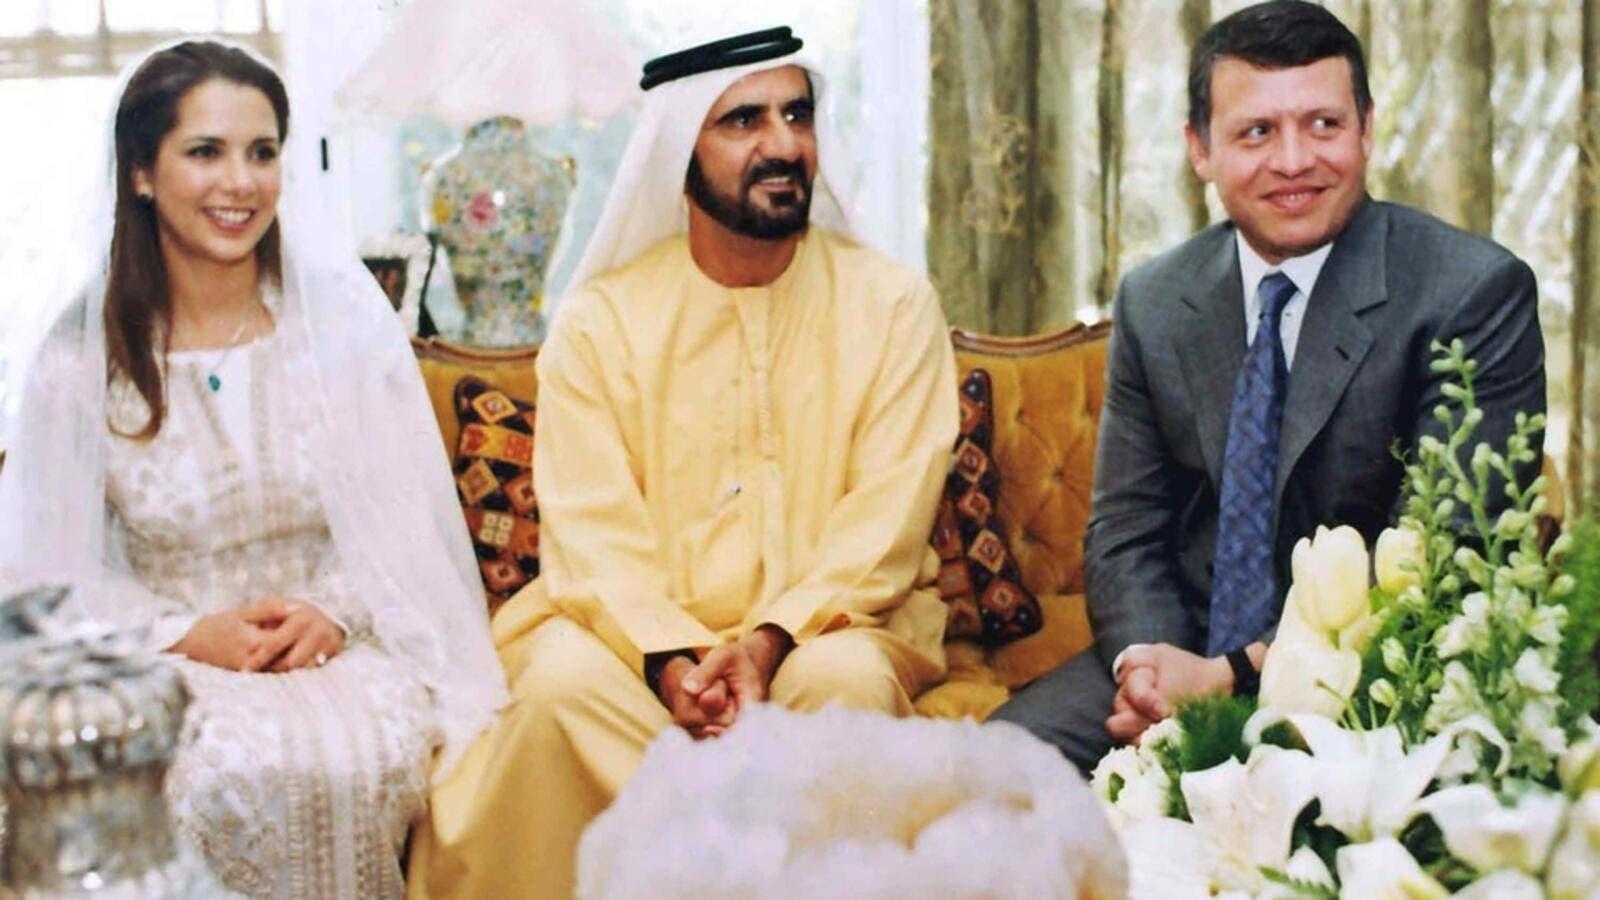 Osama Fawzi Shares Crazy Rumor that Jordanian Princess Haya